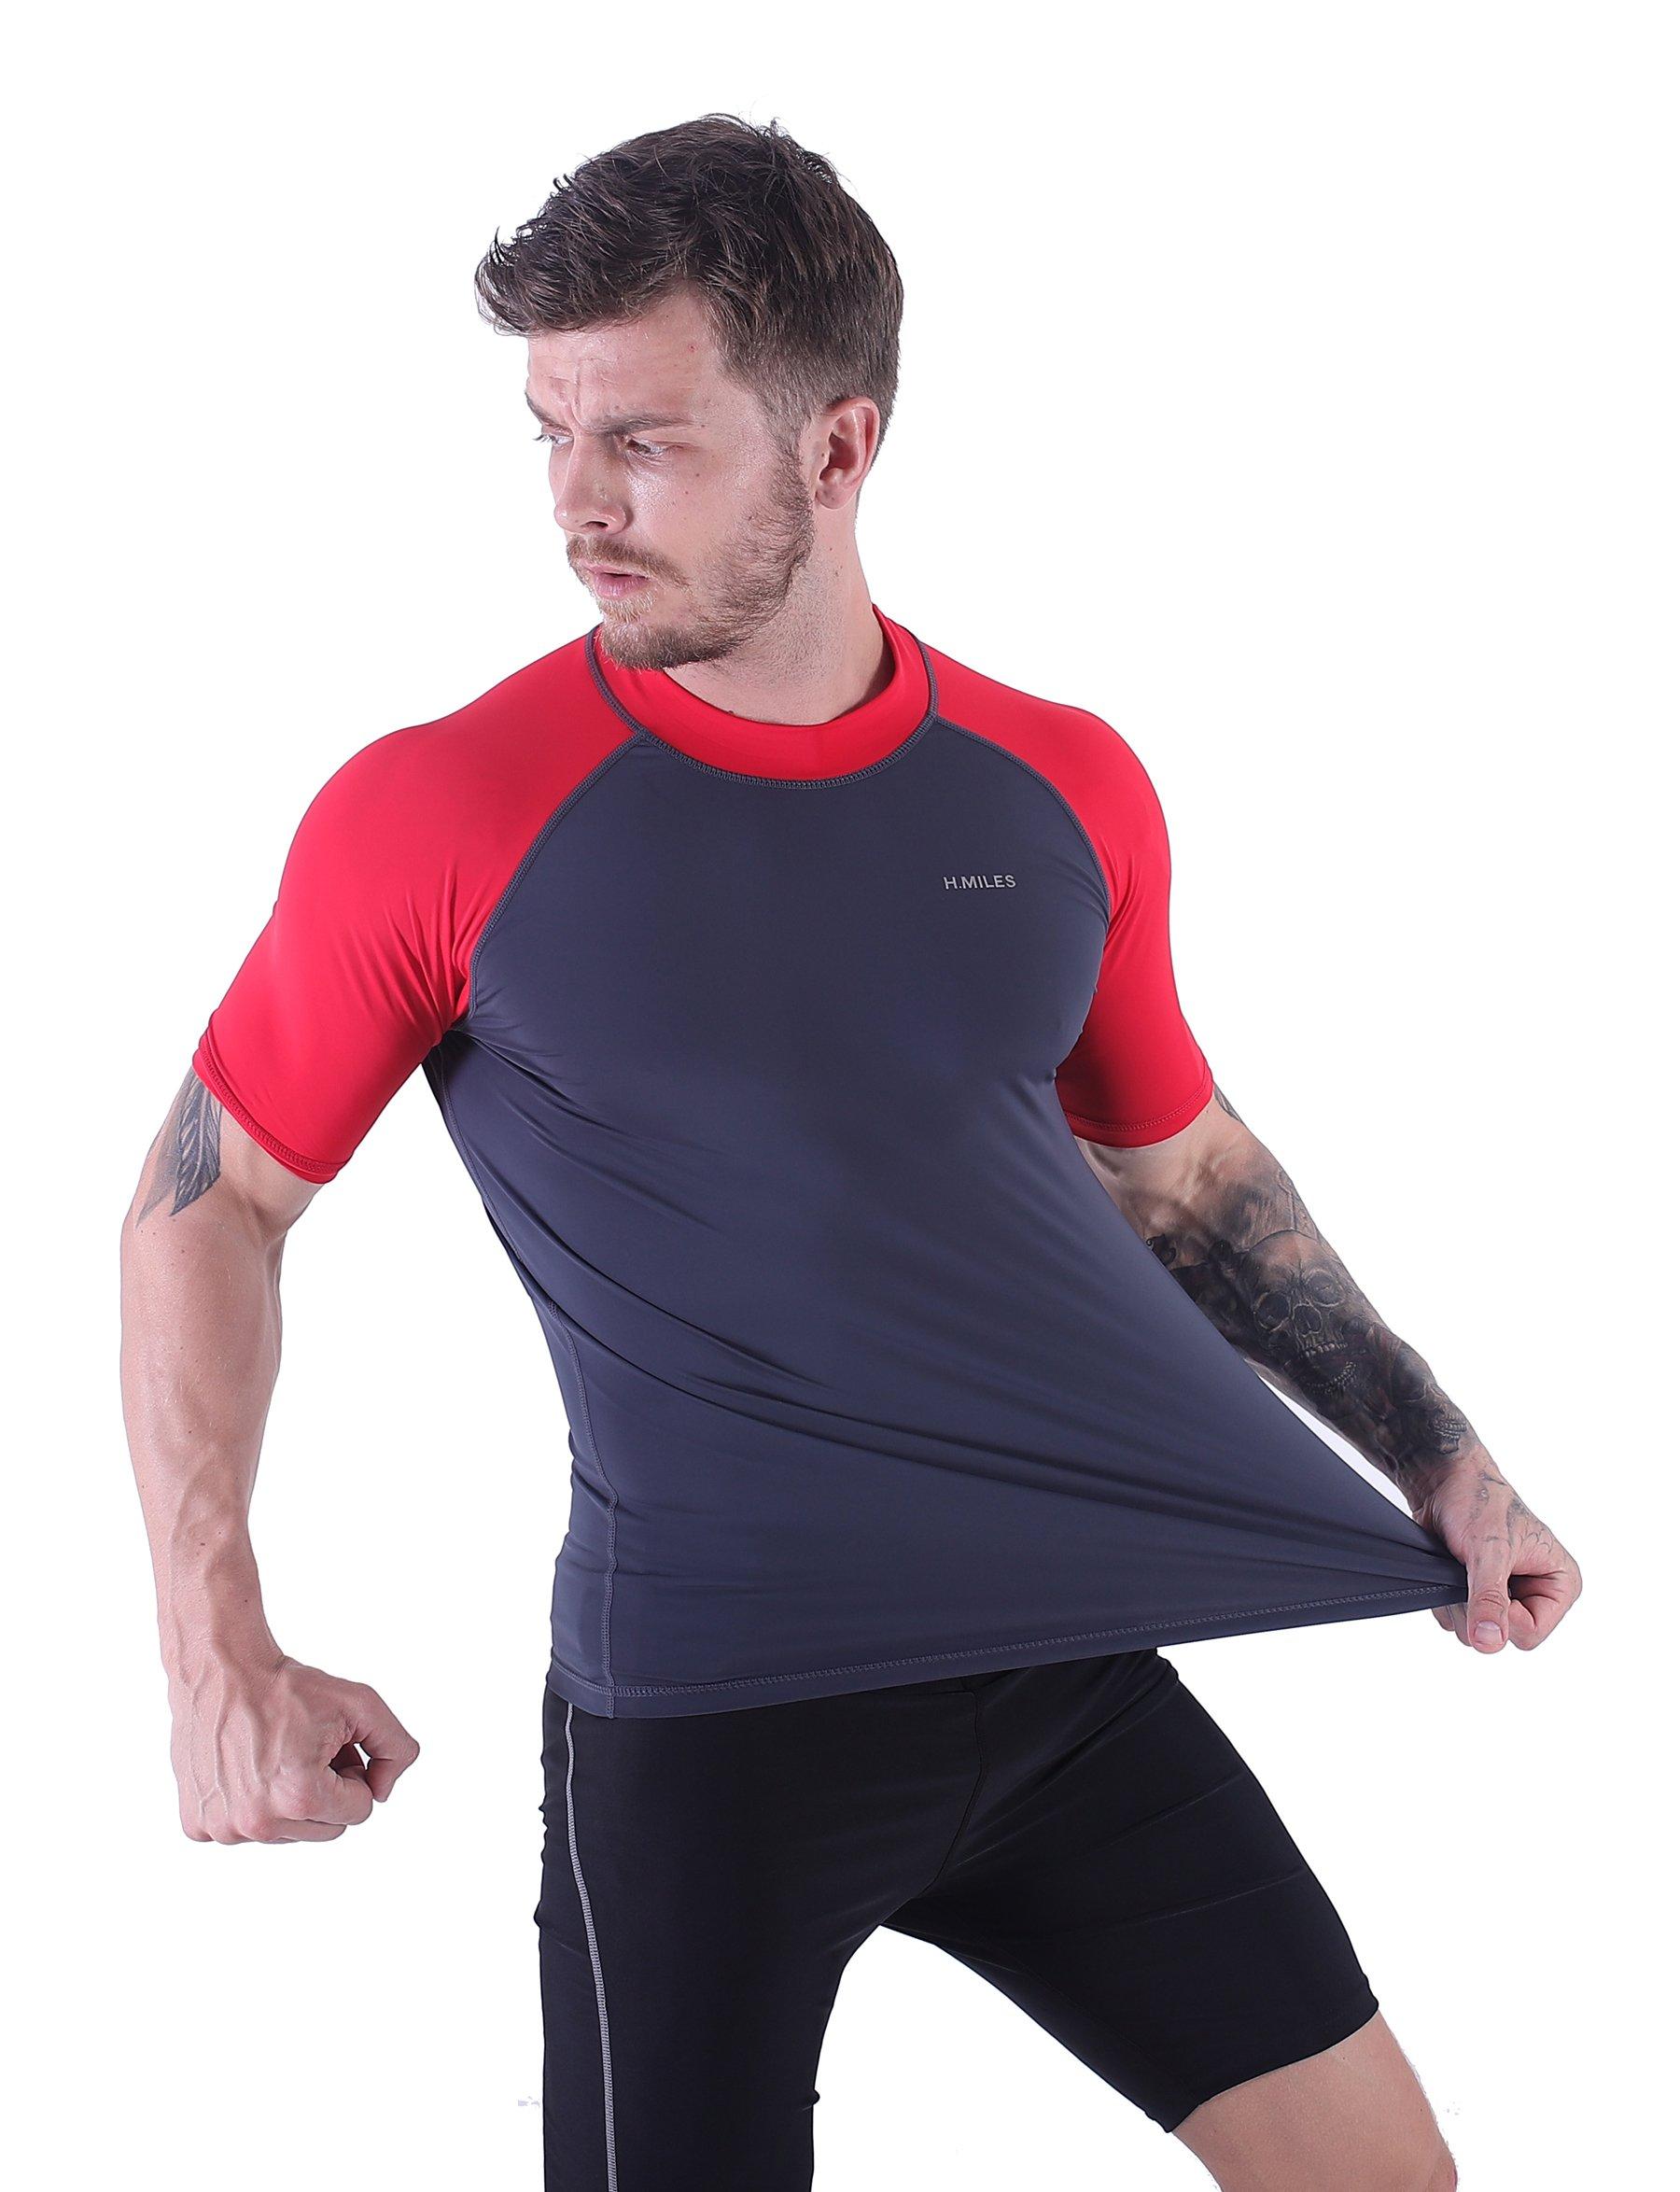 H.MILES Mens UV Protection Rash Guard Swim Shirts Short Sleeve Moisture Wicking Swimming Shirts Workout Swimwear Tops Asphalt/Fuchsin-3XL by H.MILES